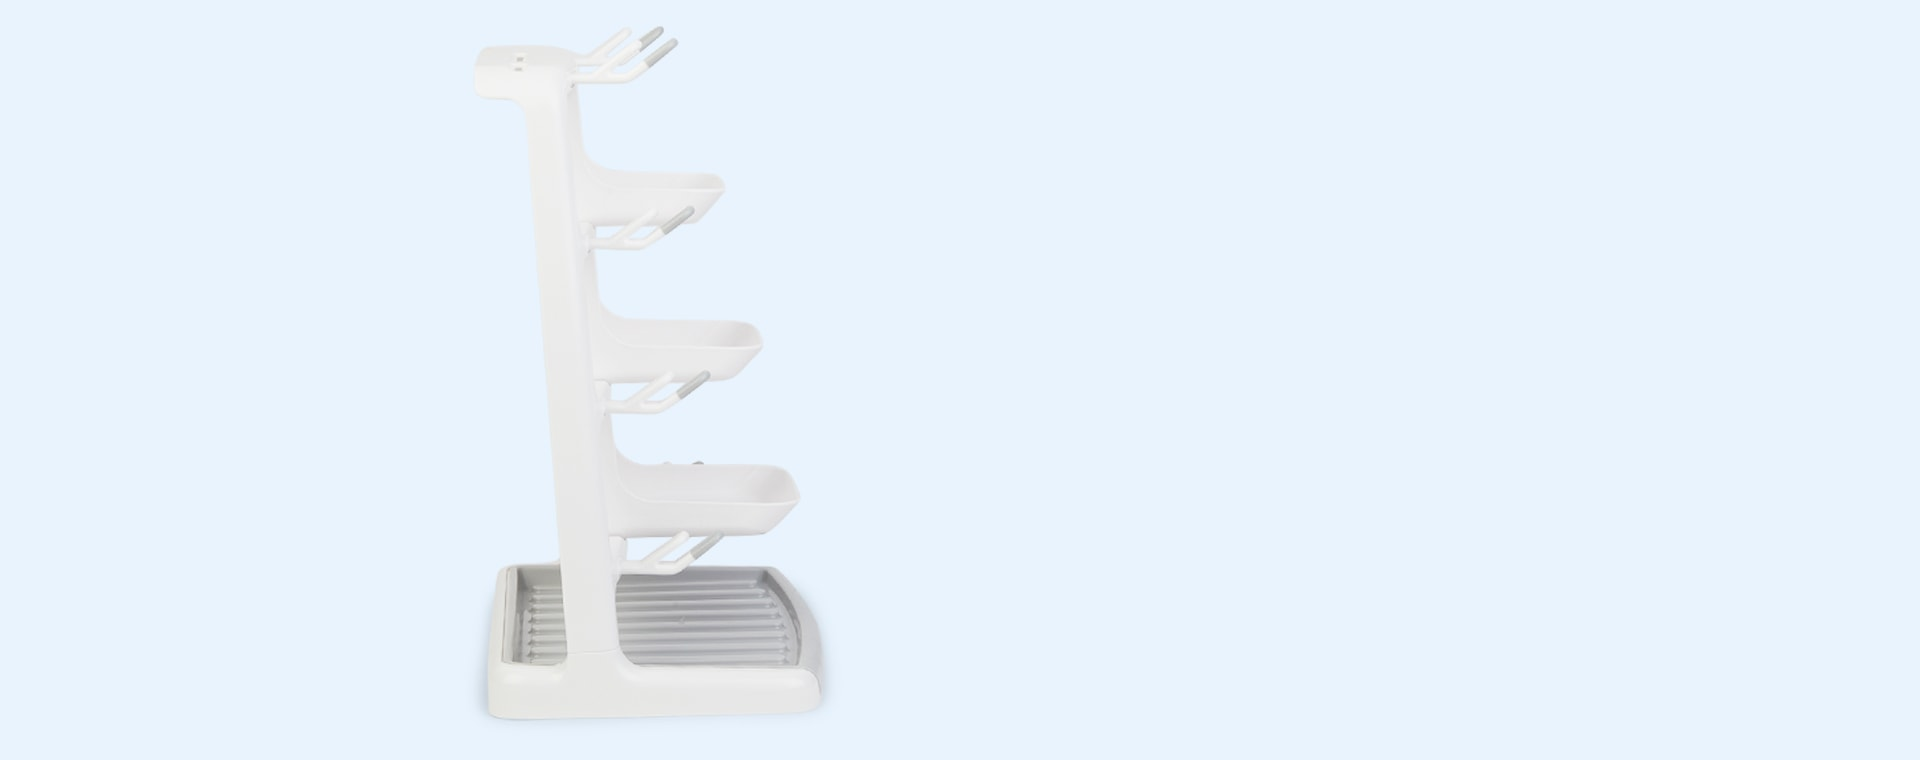 White and Grey Munchkin Space Saving Drying Rack